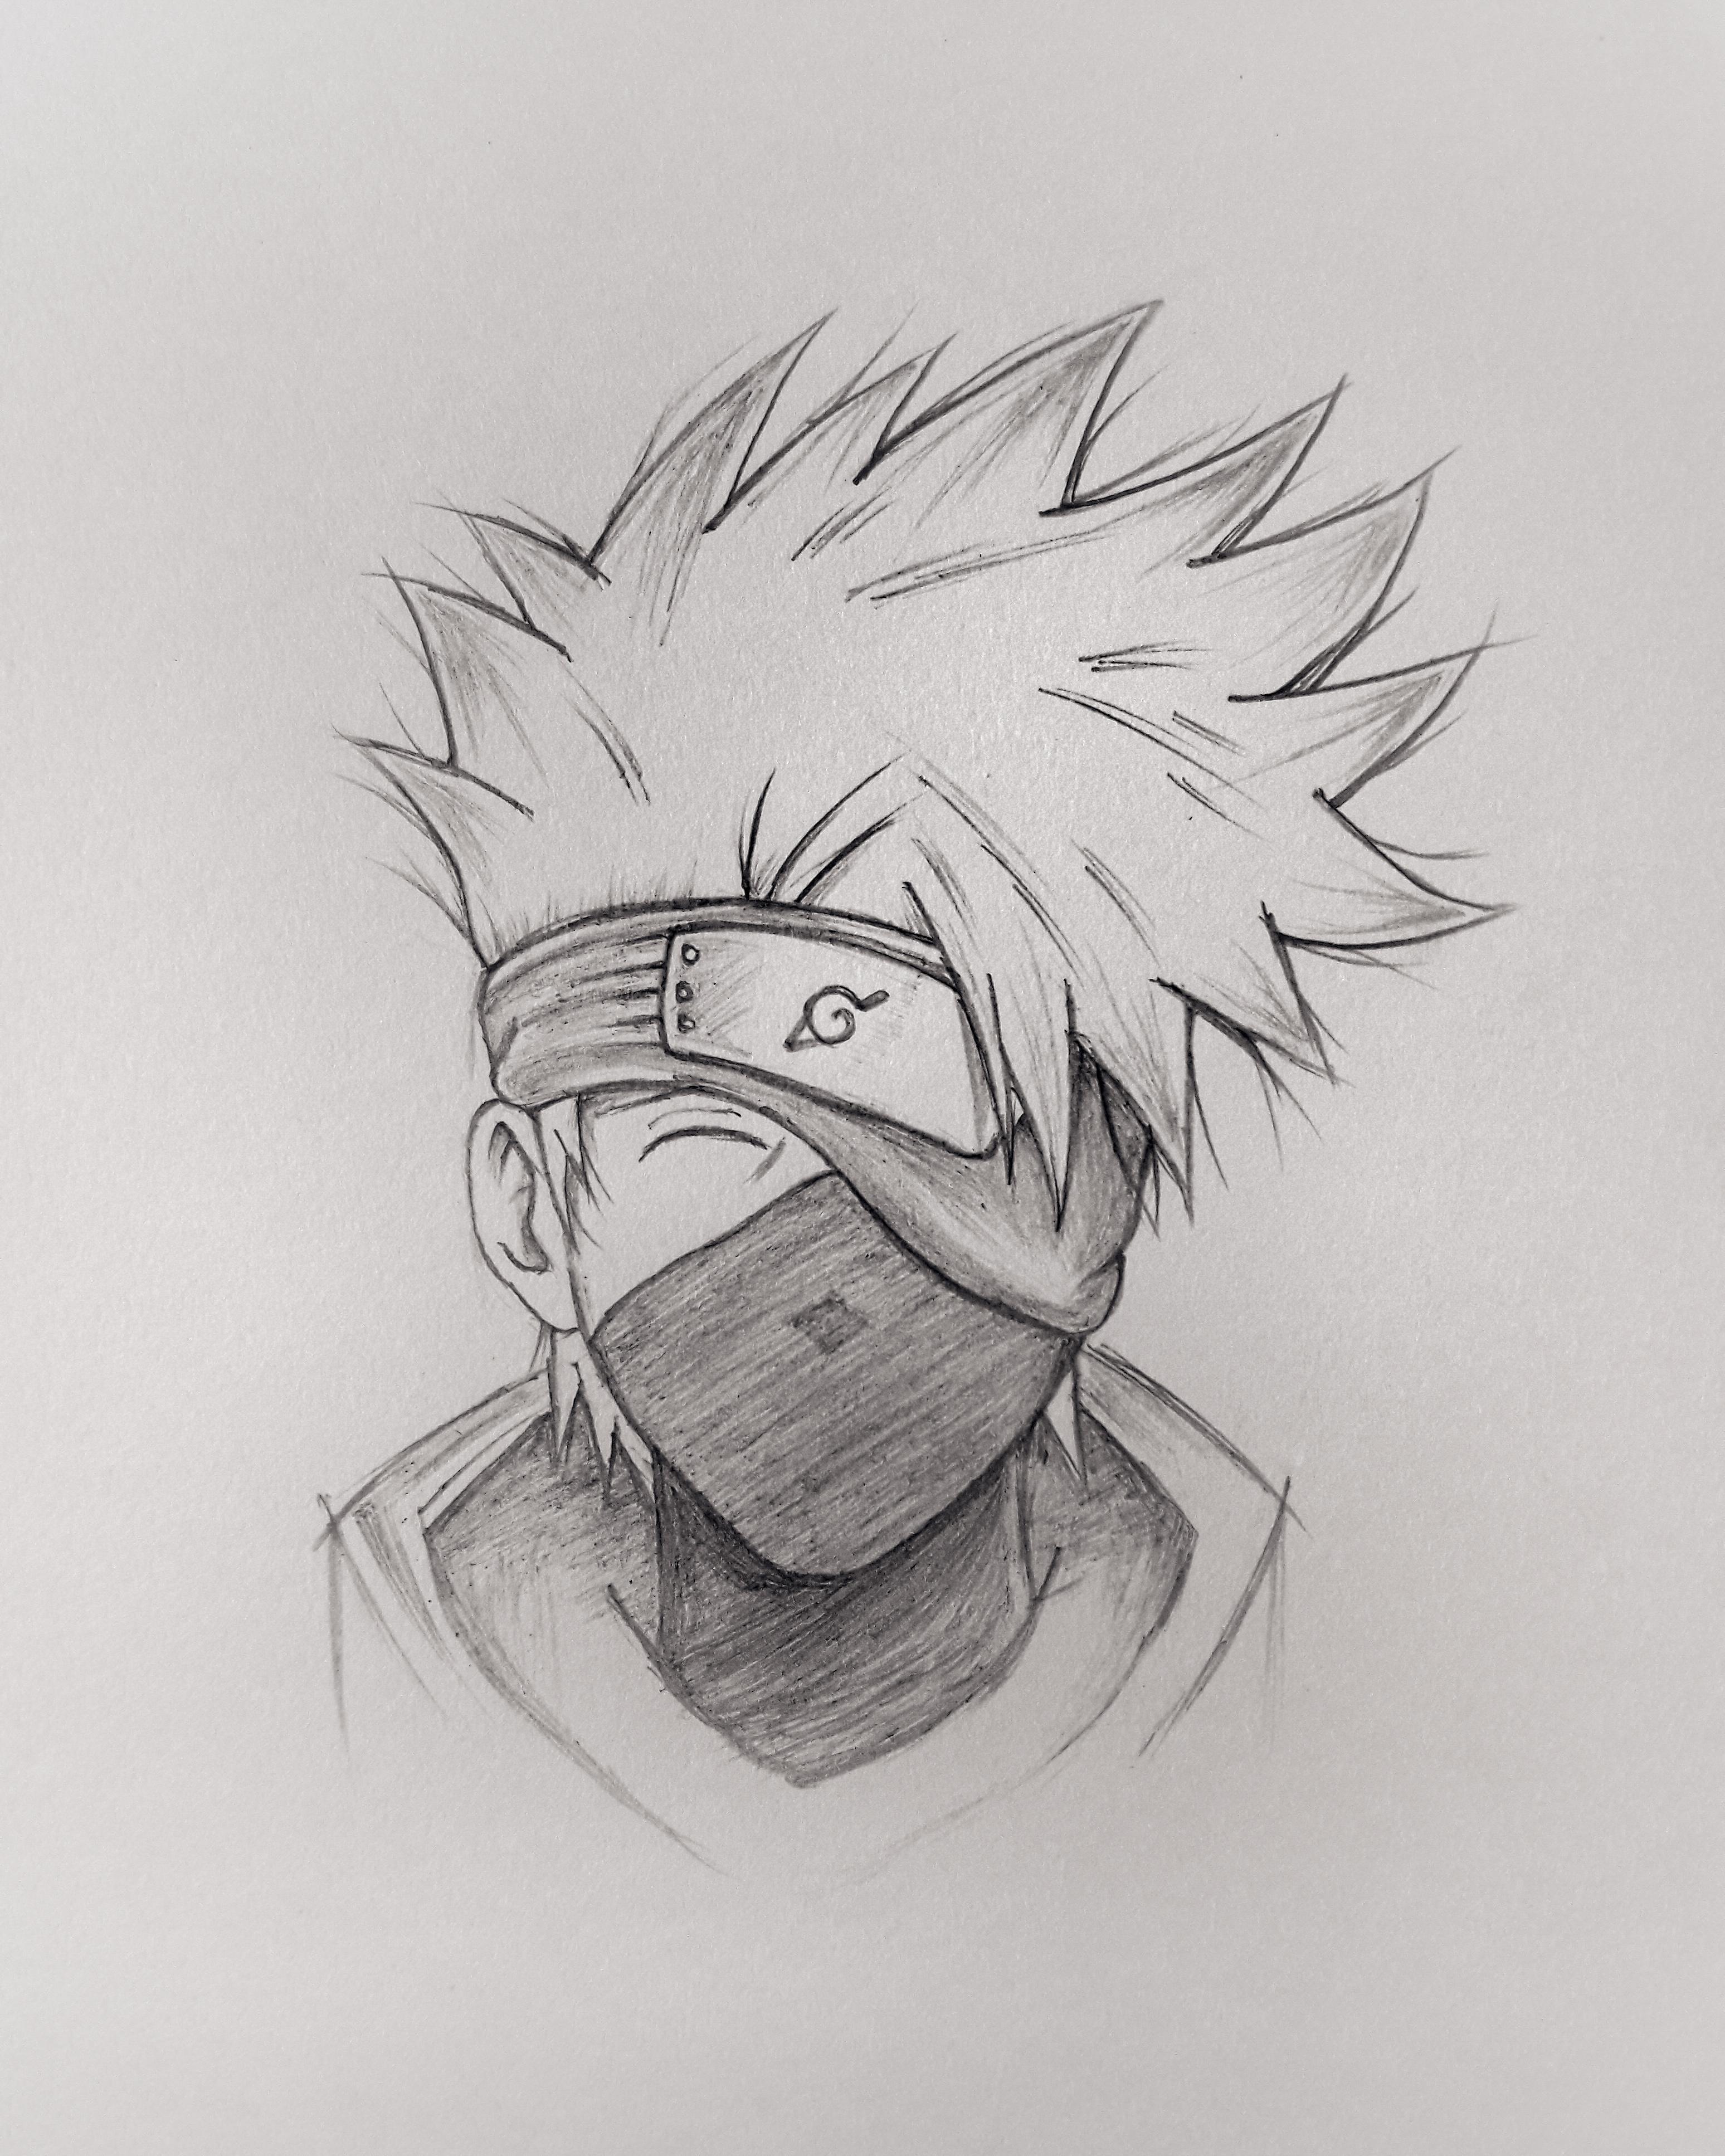 Kakashi Hatake Drawing : kakashi, hatake, drawing, Kakashi, Hatake, Drawing, Photo, Skill